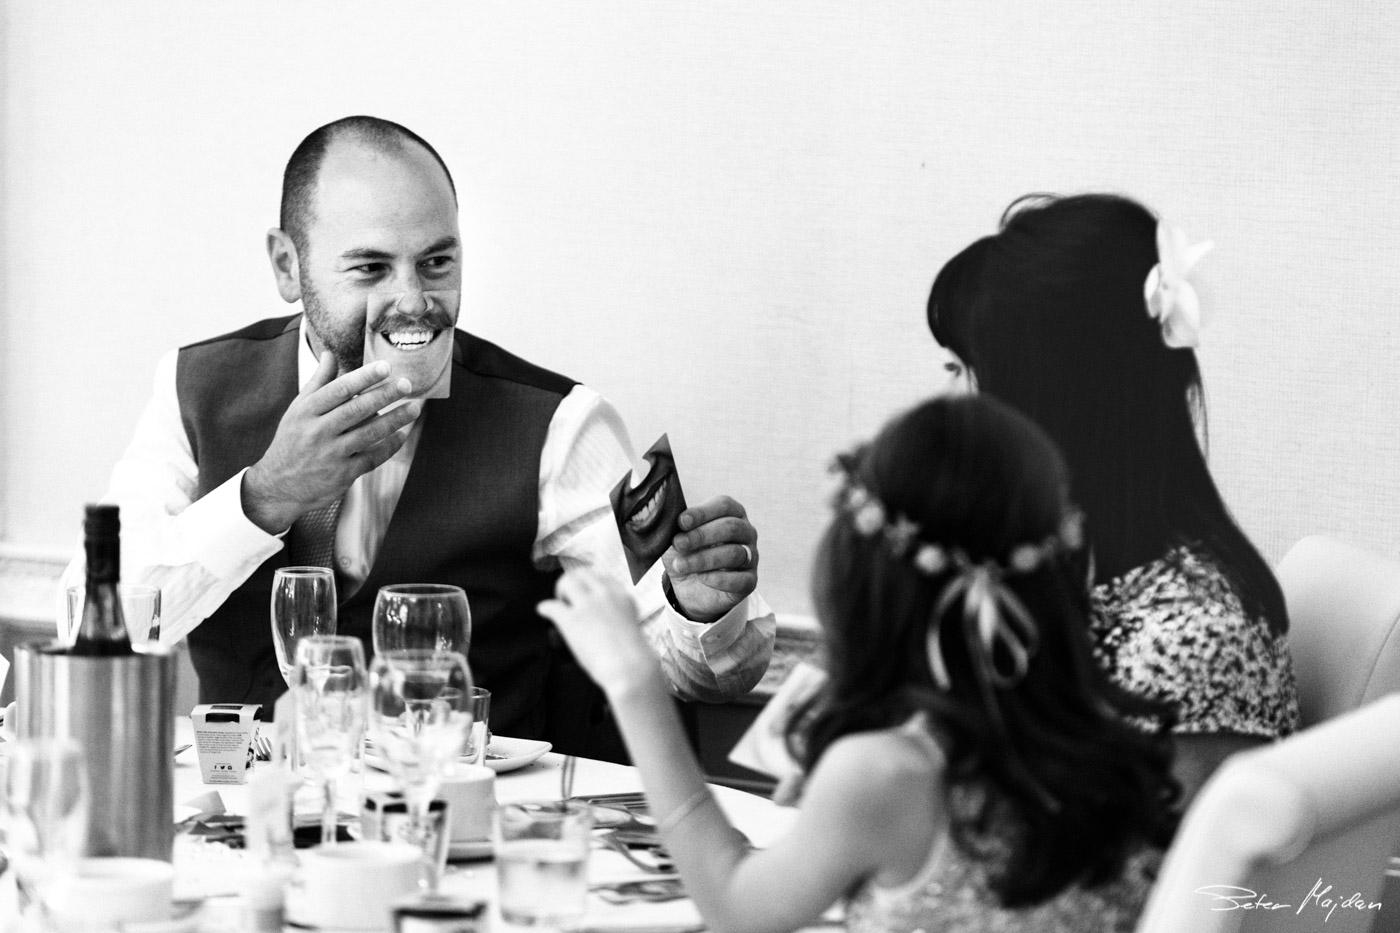 Colwick-hall-wedding-photography-48.jpg